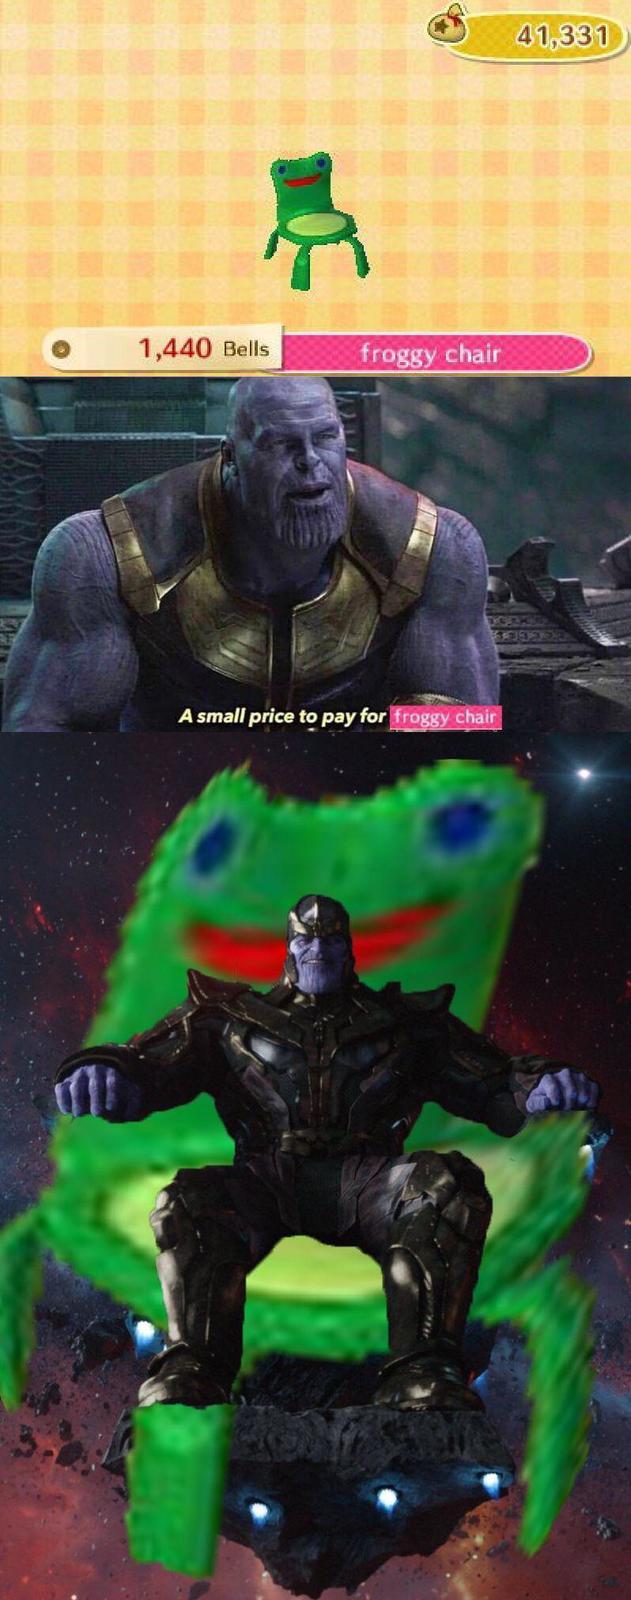 Froggy Chair in 2020 Animal crossing memes, Animal